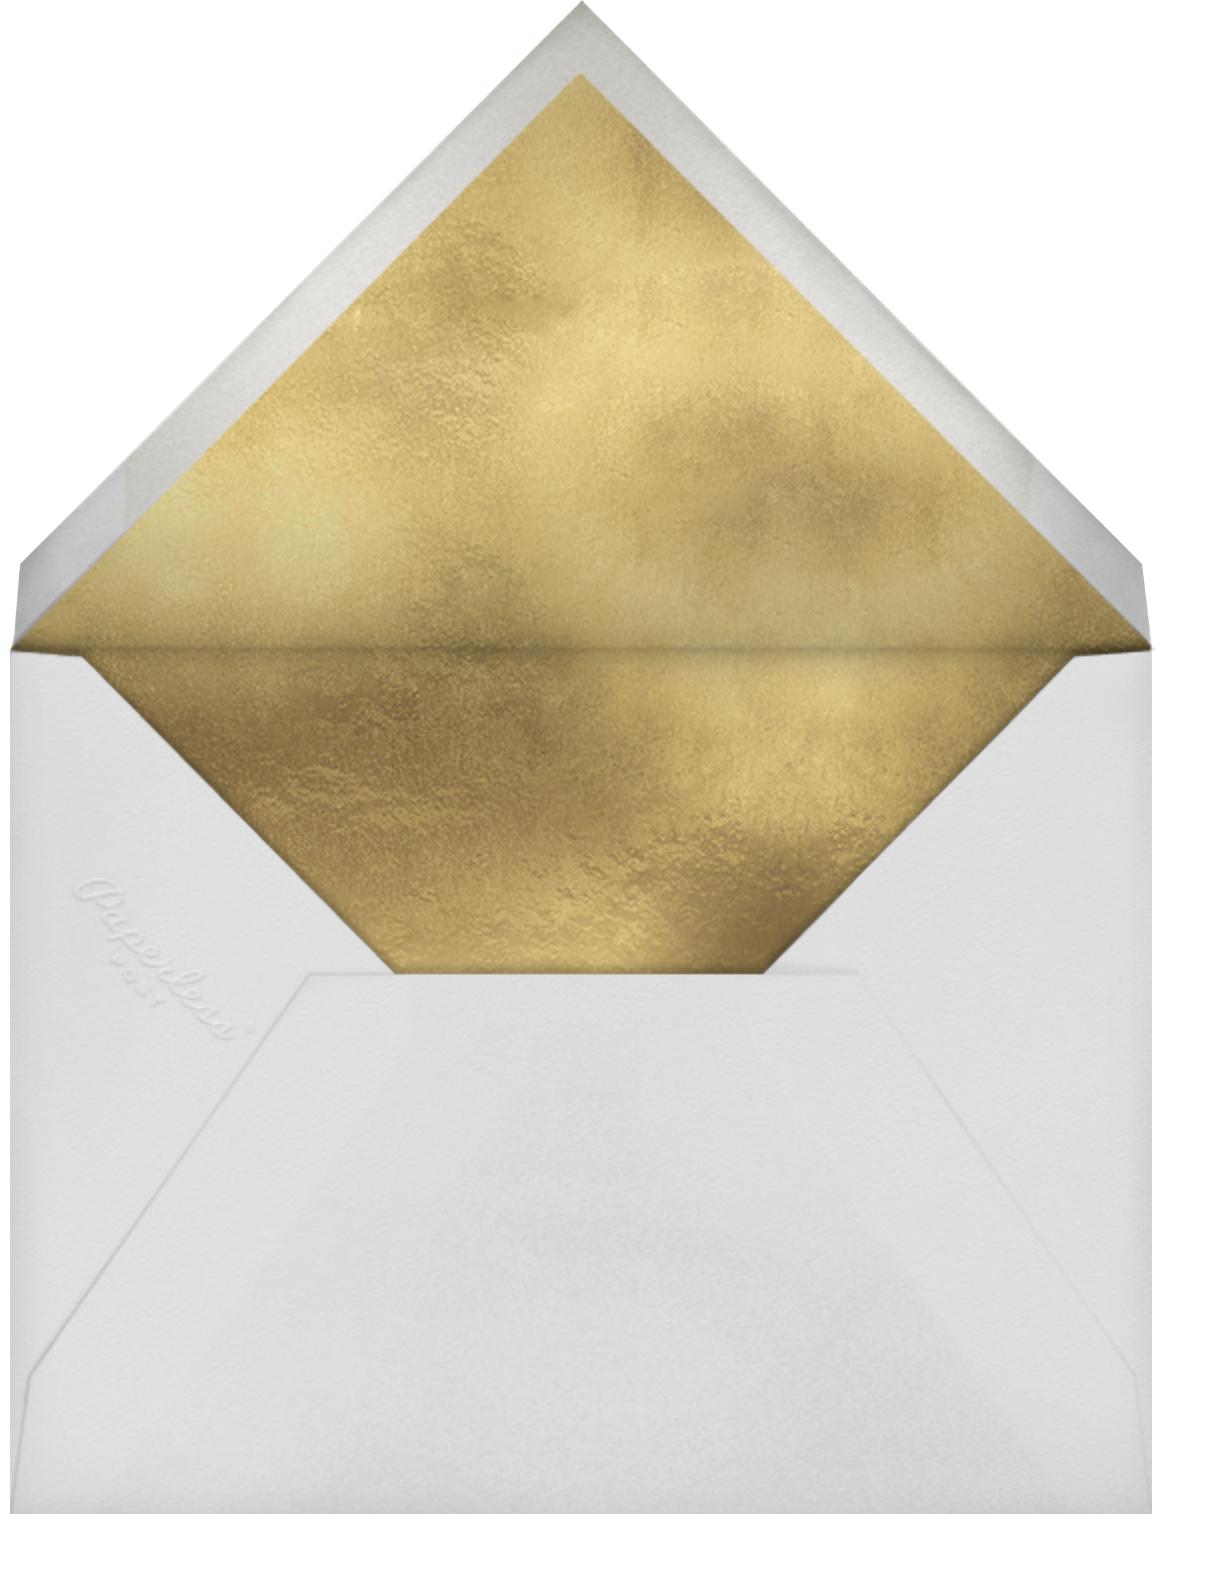 Striped Tulips - Black - Oscar de la Renta - General entertaining - envelope back